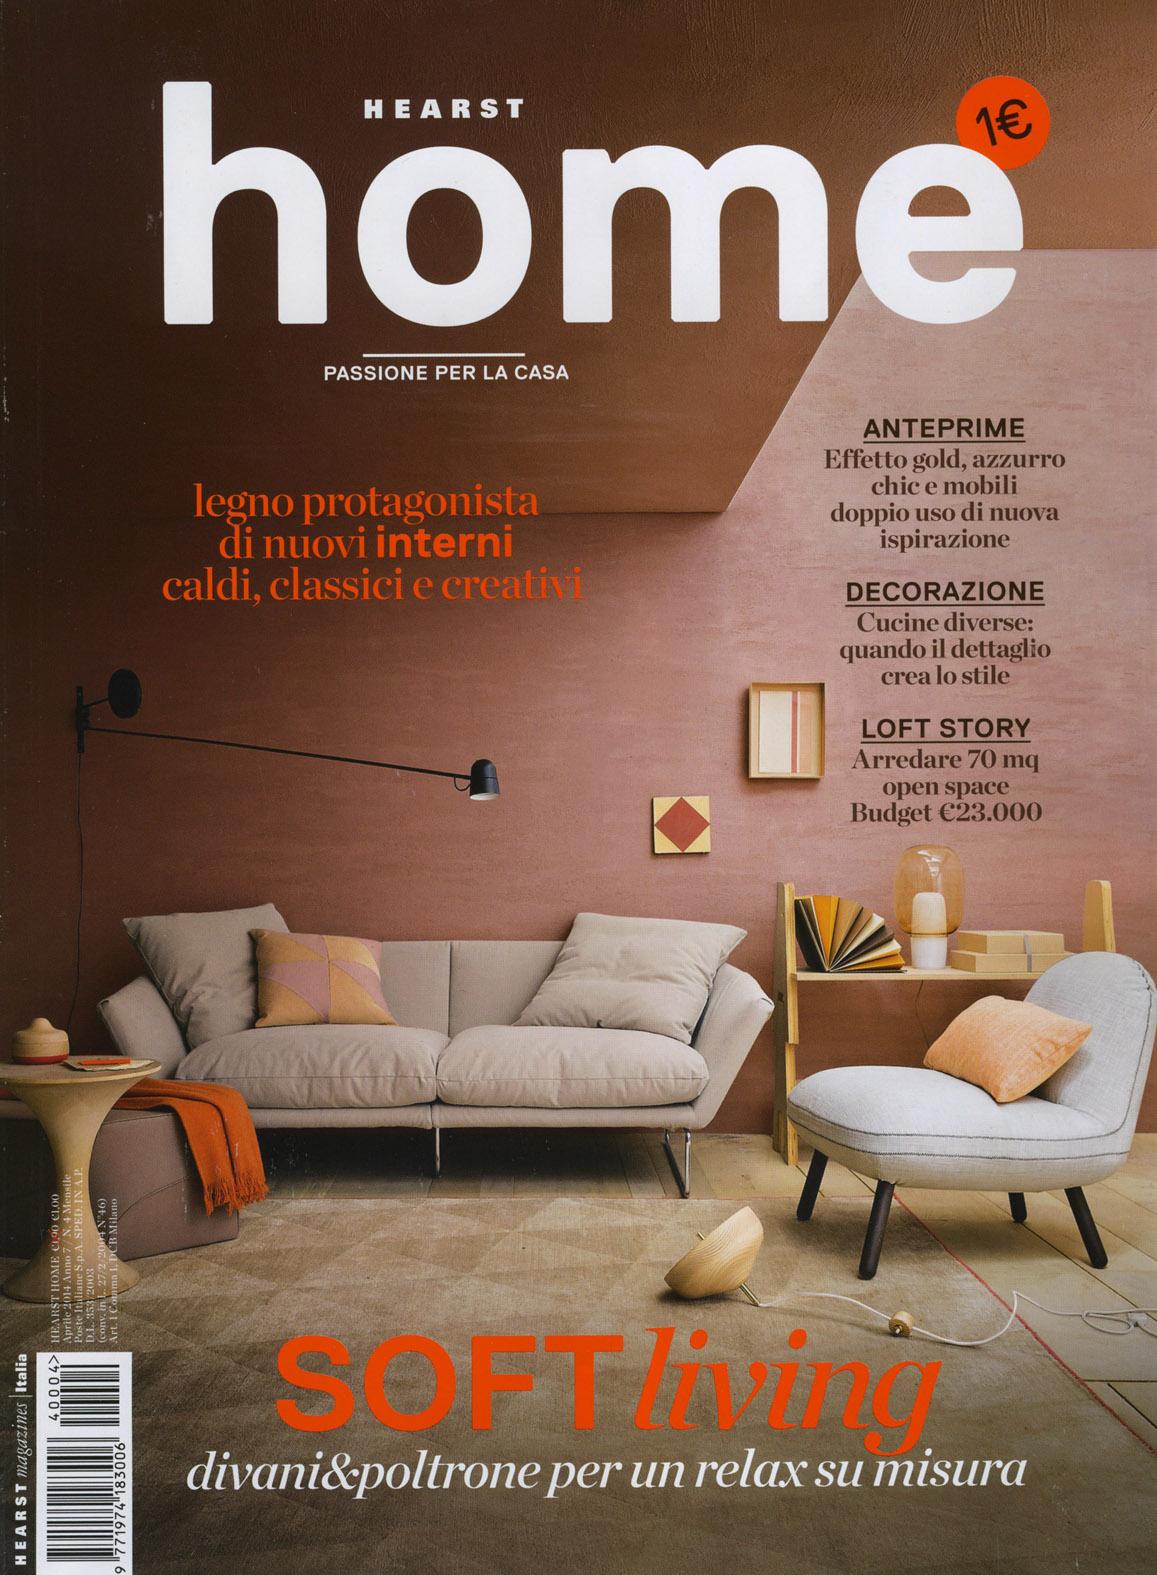 Wooden parquet flooring decoration design magazines april for International home decor magazines